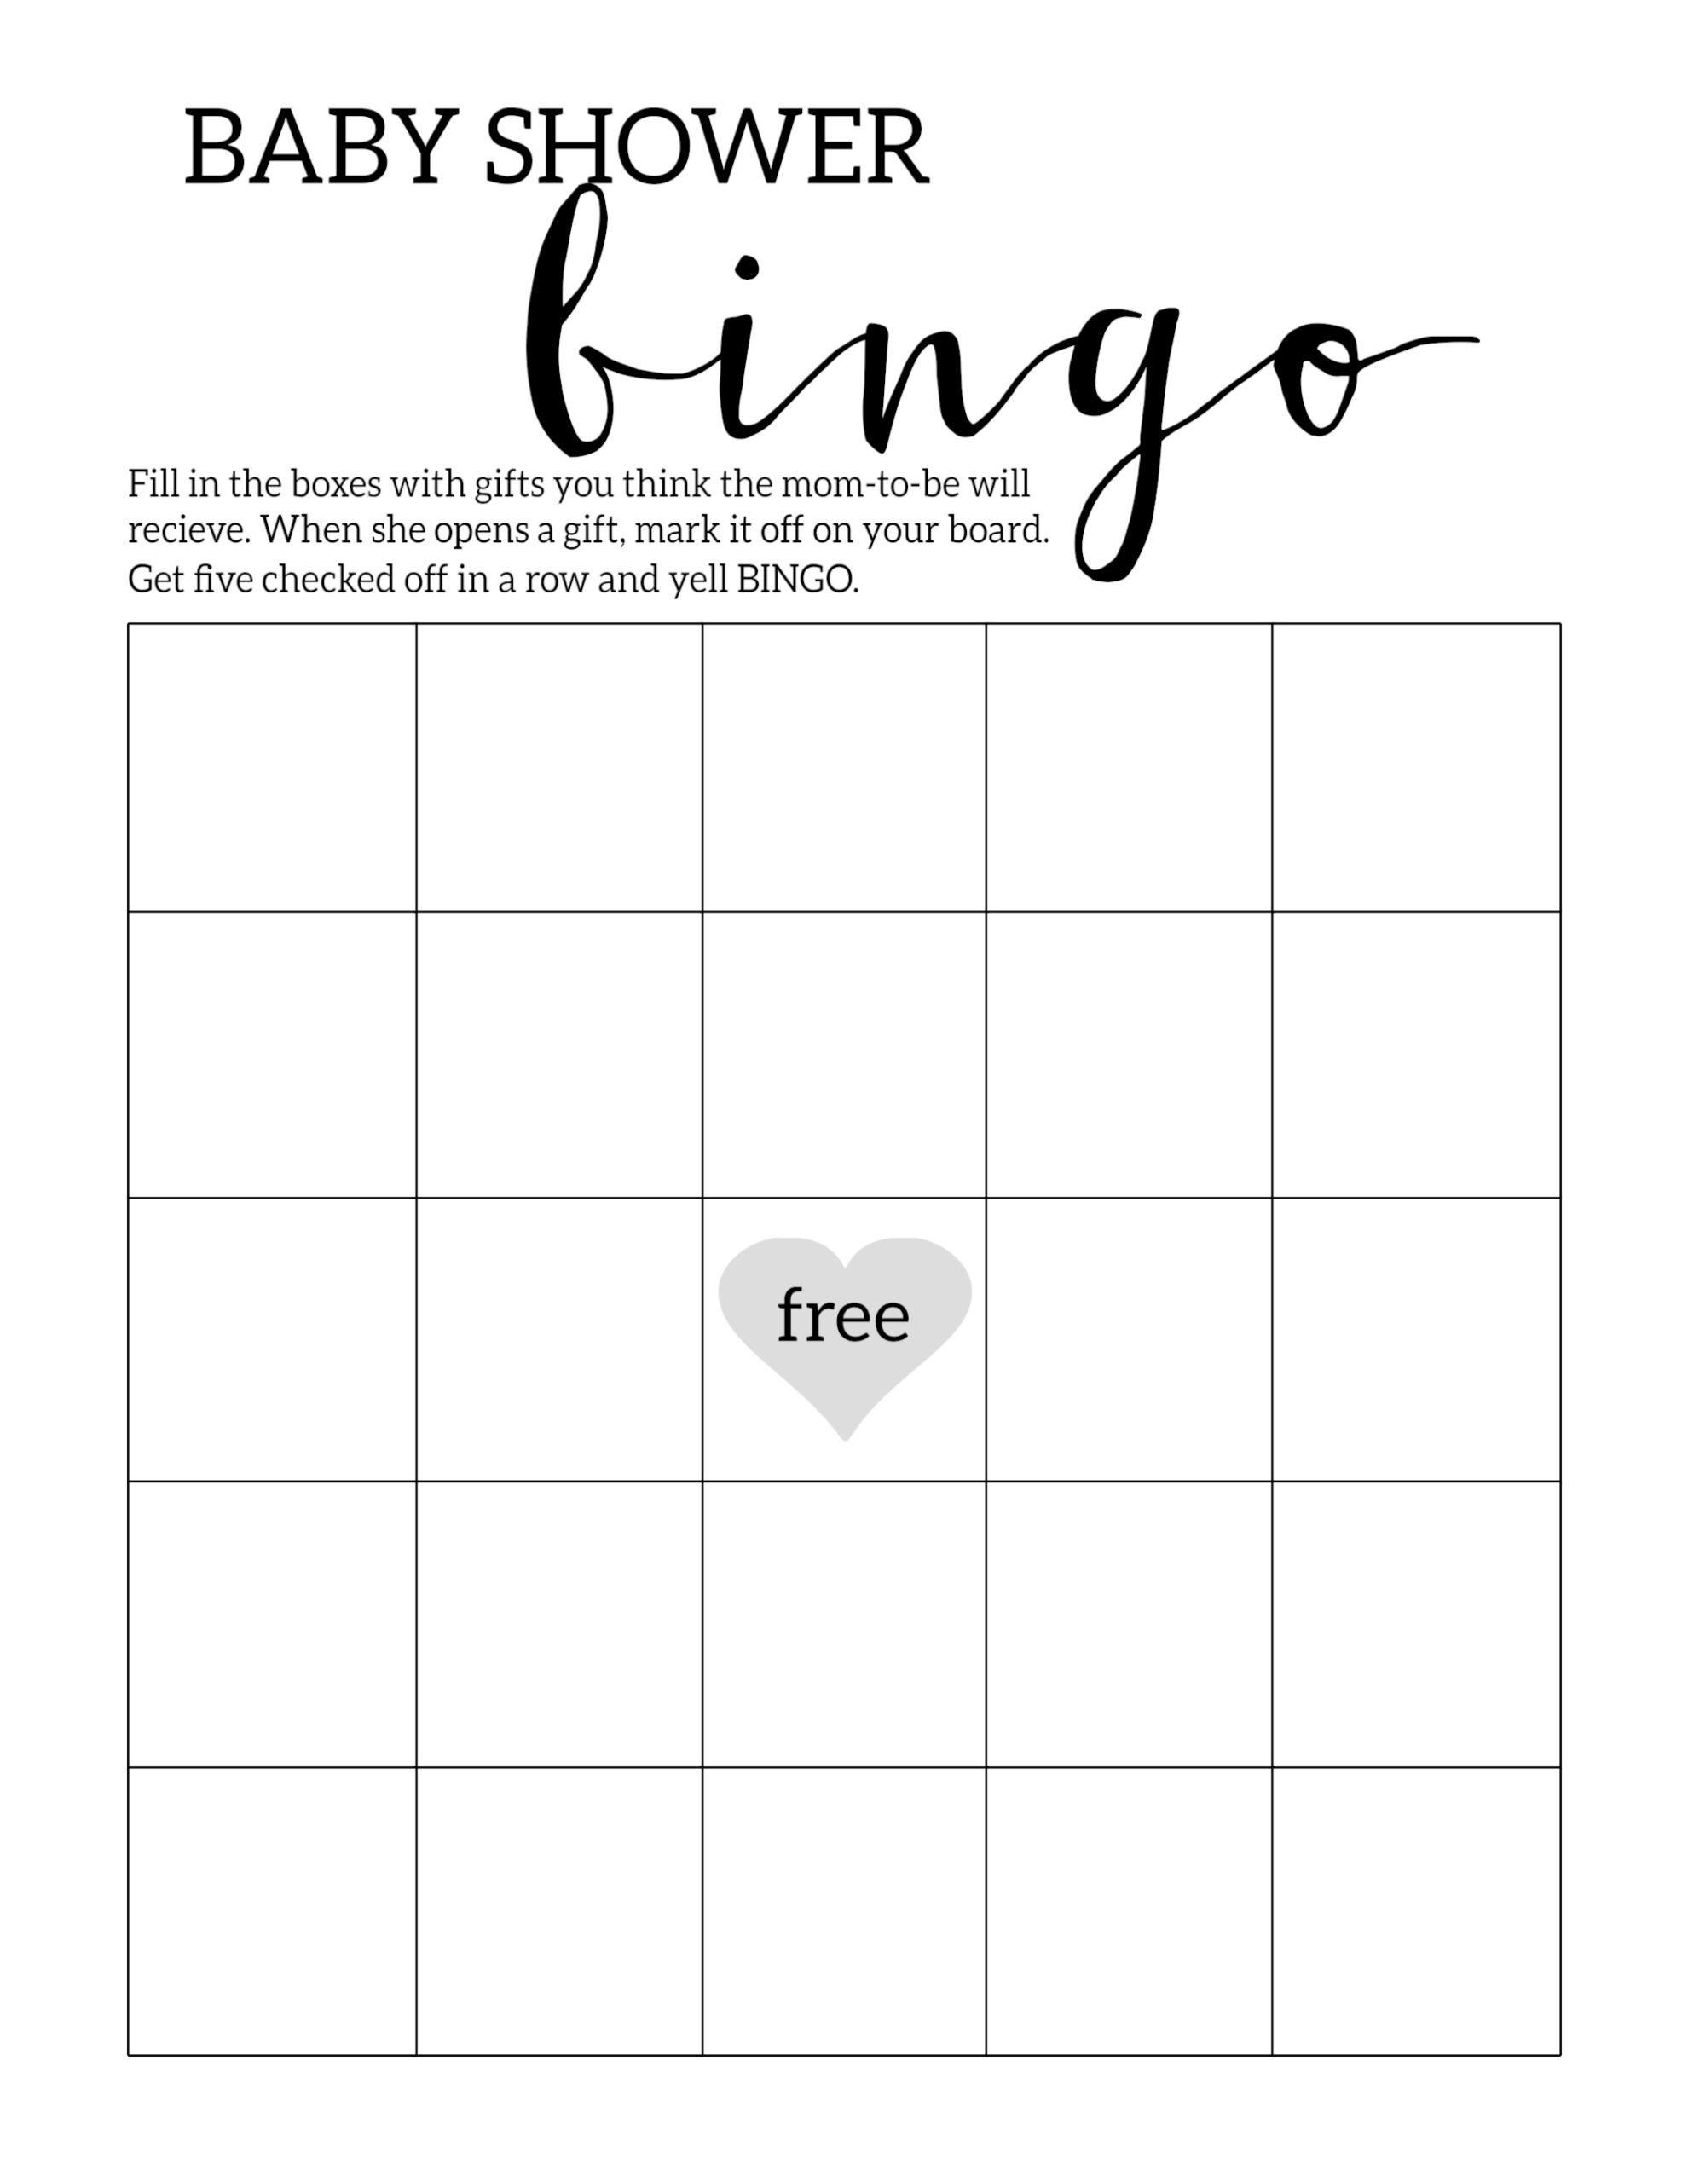 Baby Shower Bingo Printable Cards Template - Paper Trail Design - Baby Bingo Free Printable Template